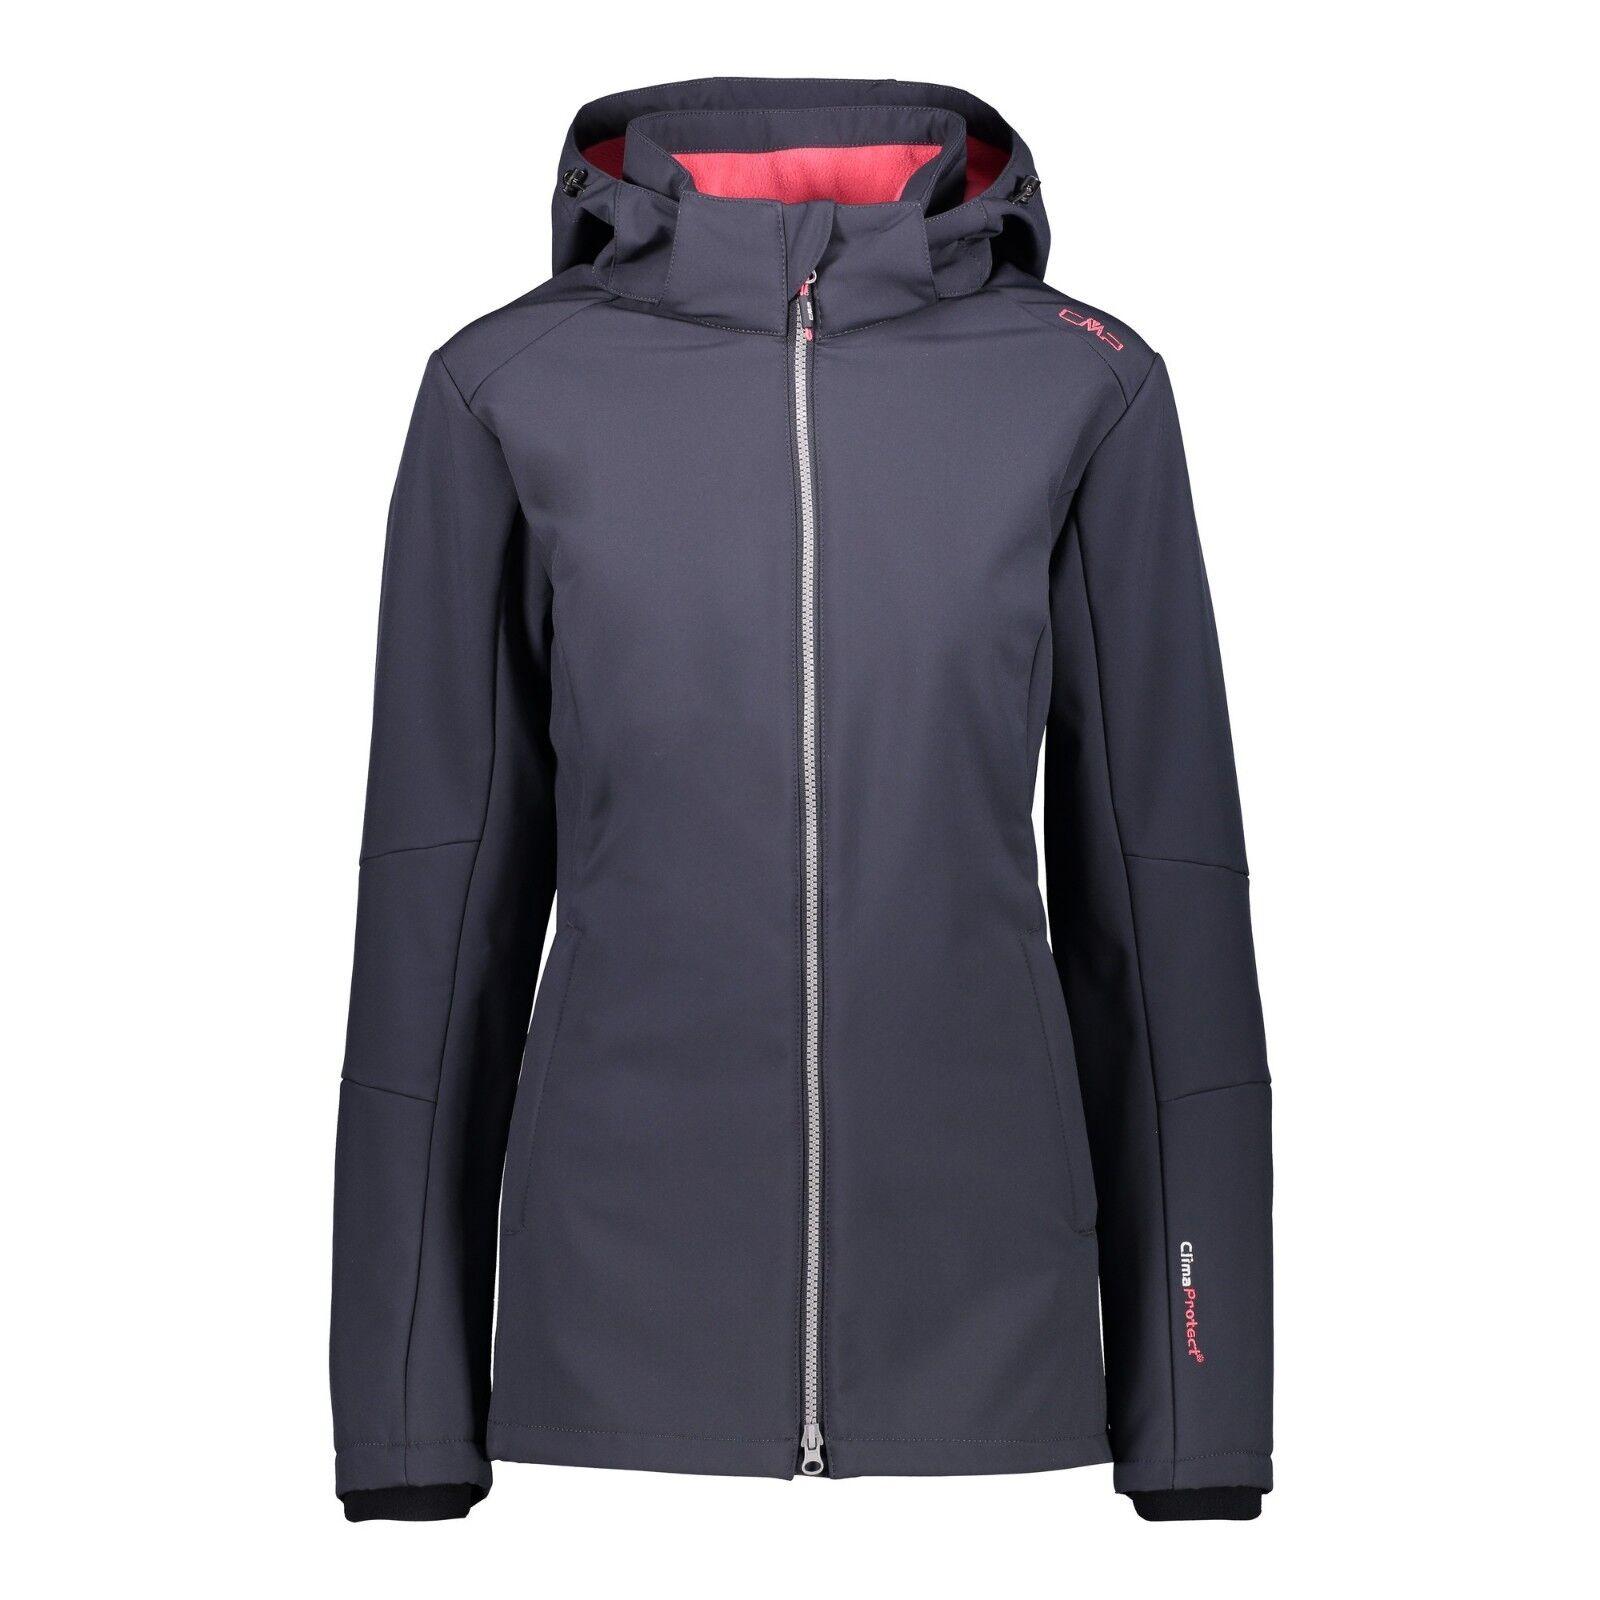 CMP Jacke 3A22226 Damen Softshelljacke Woman Jacket  grau antracite anthrazit